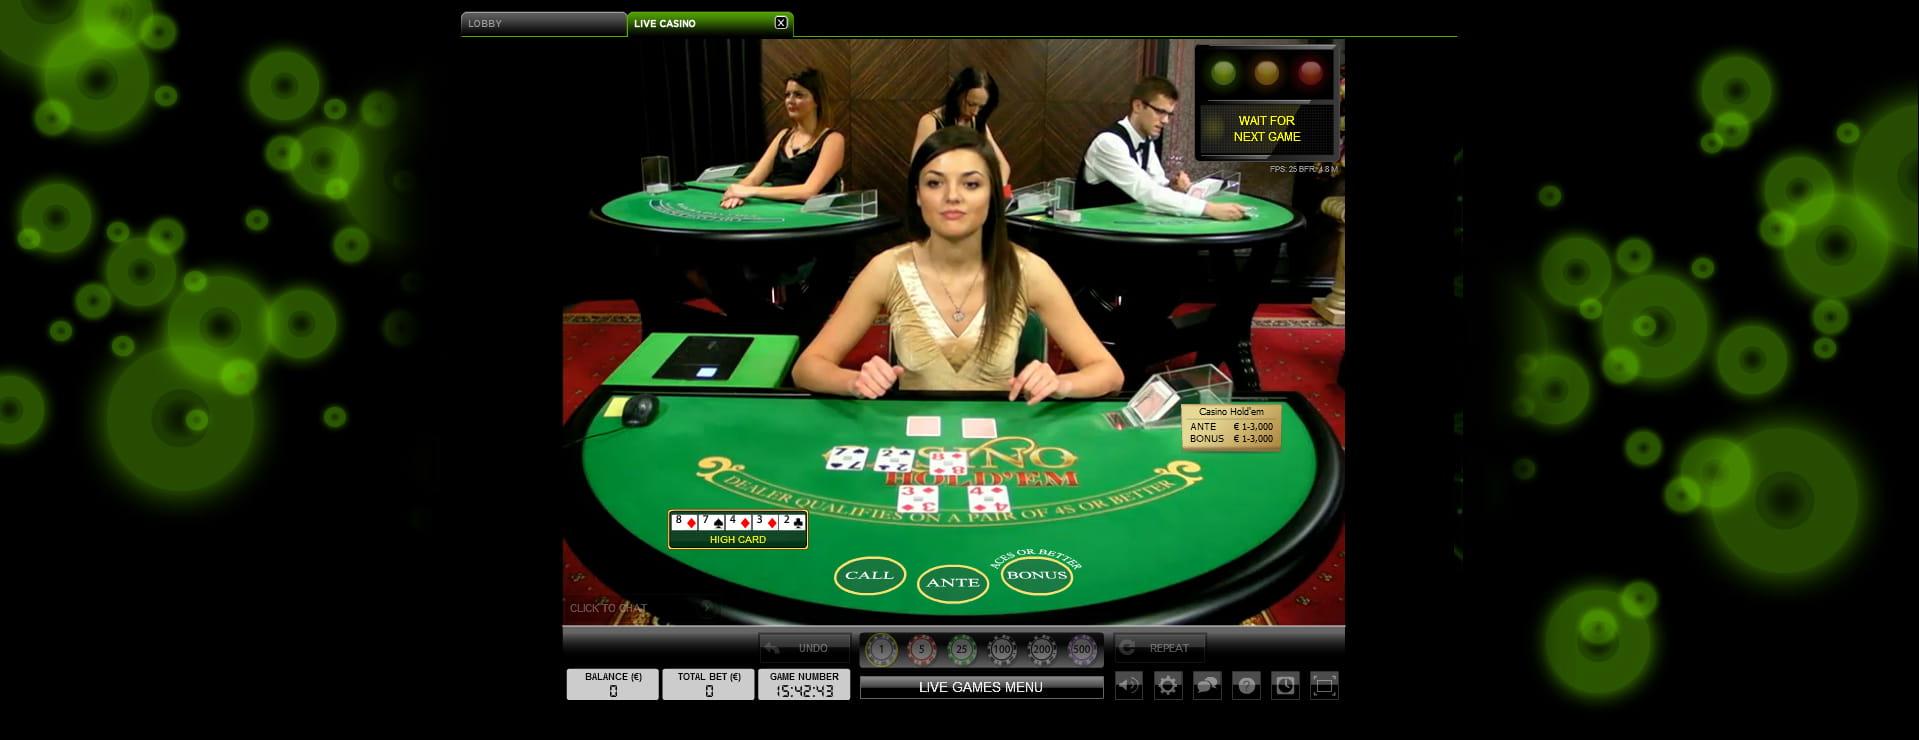 b3w group casino